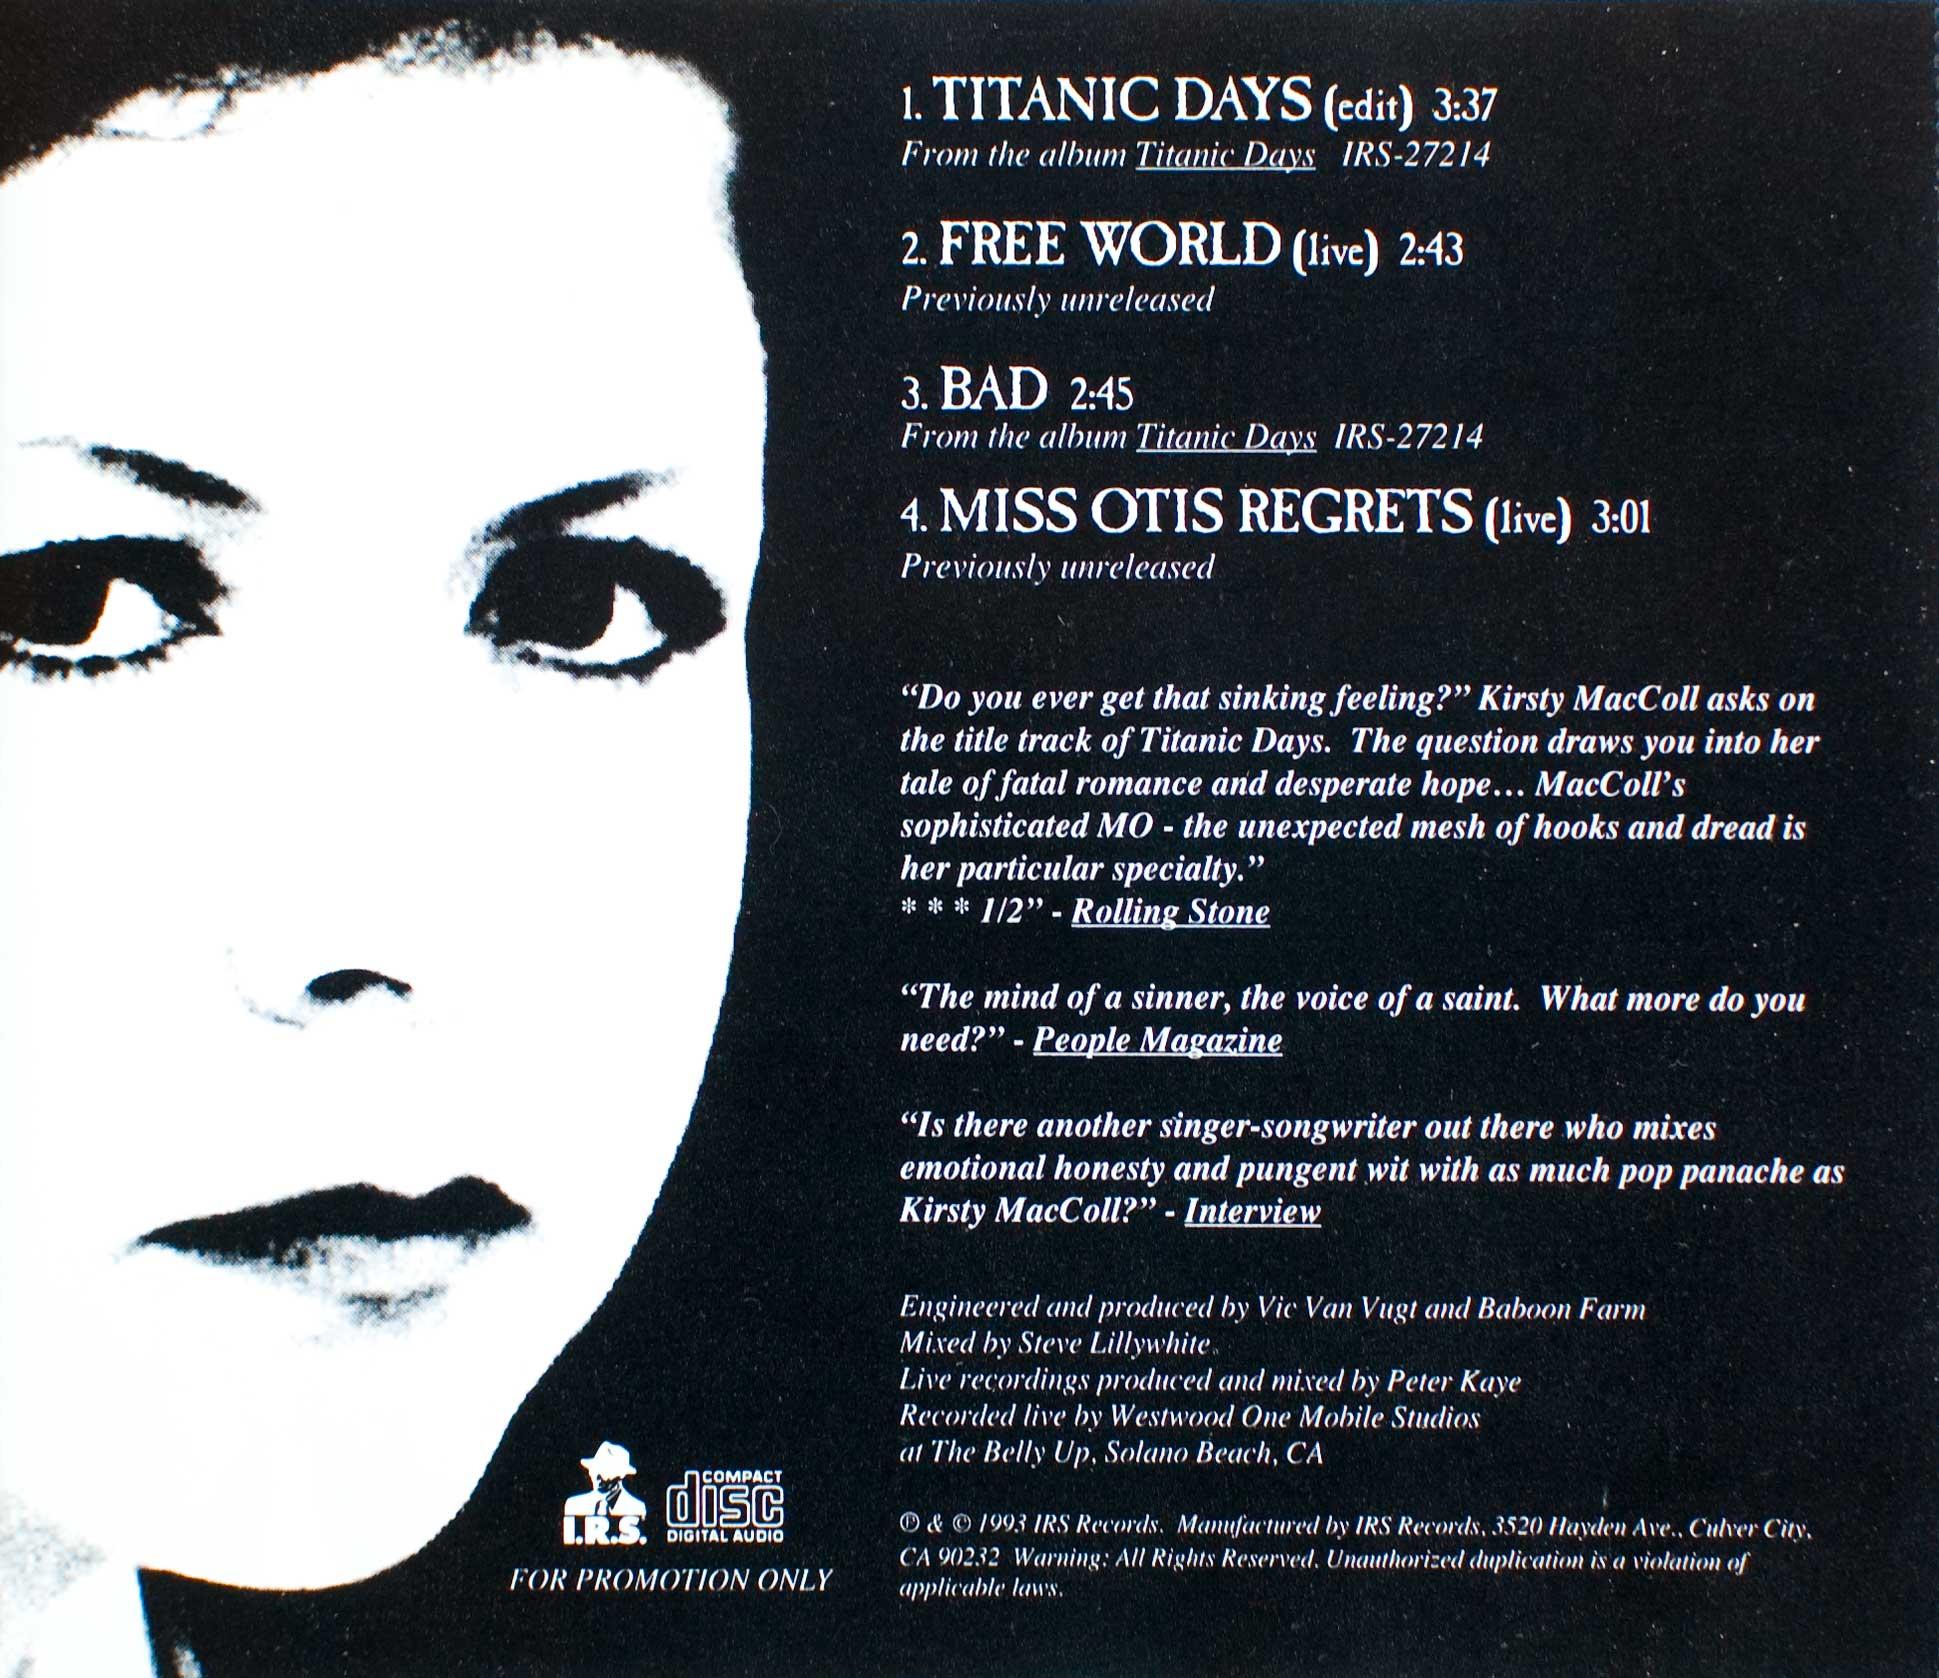 Titanic Days CD promo (US) back cover